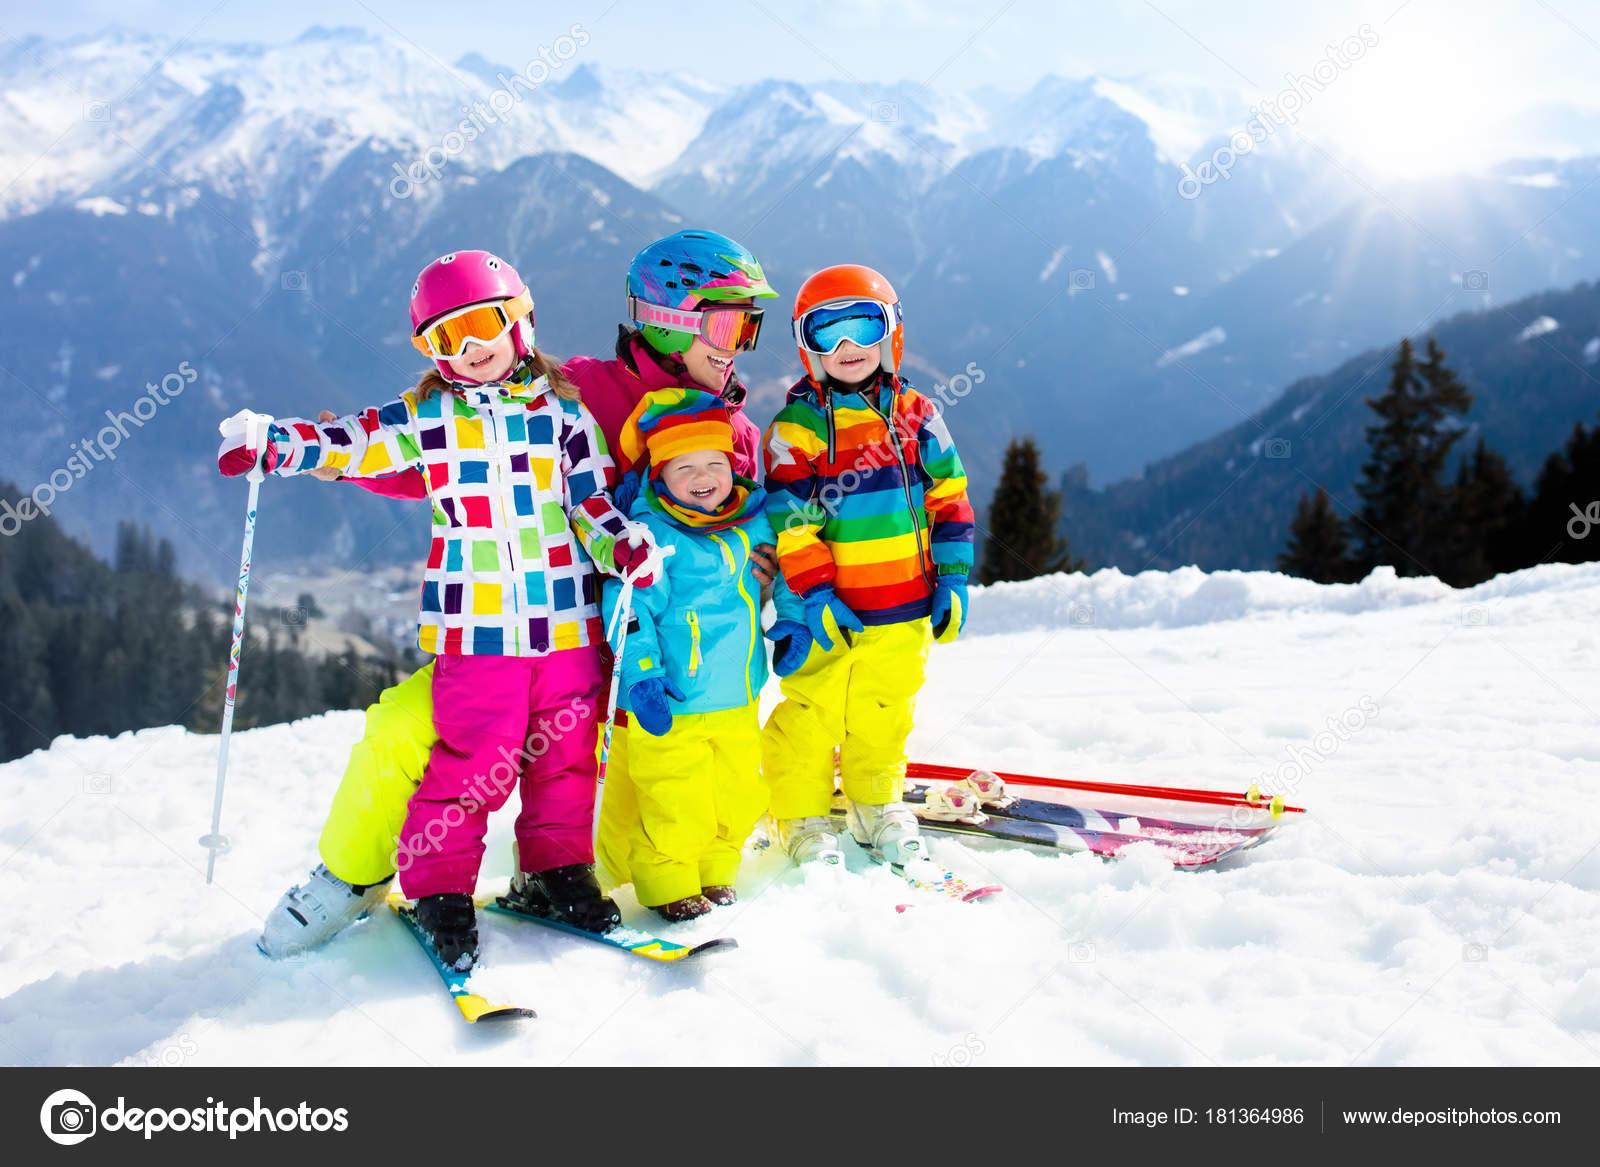 b3c689c9d430 Family ski vacation. Winter snow sport for kids. — Stock Photo ...